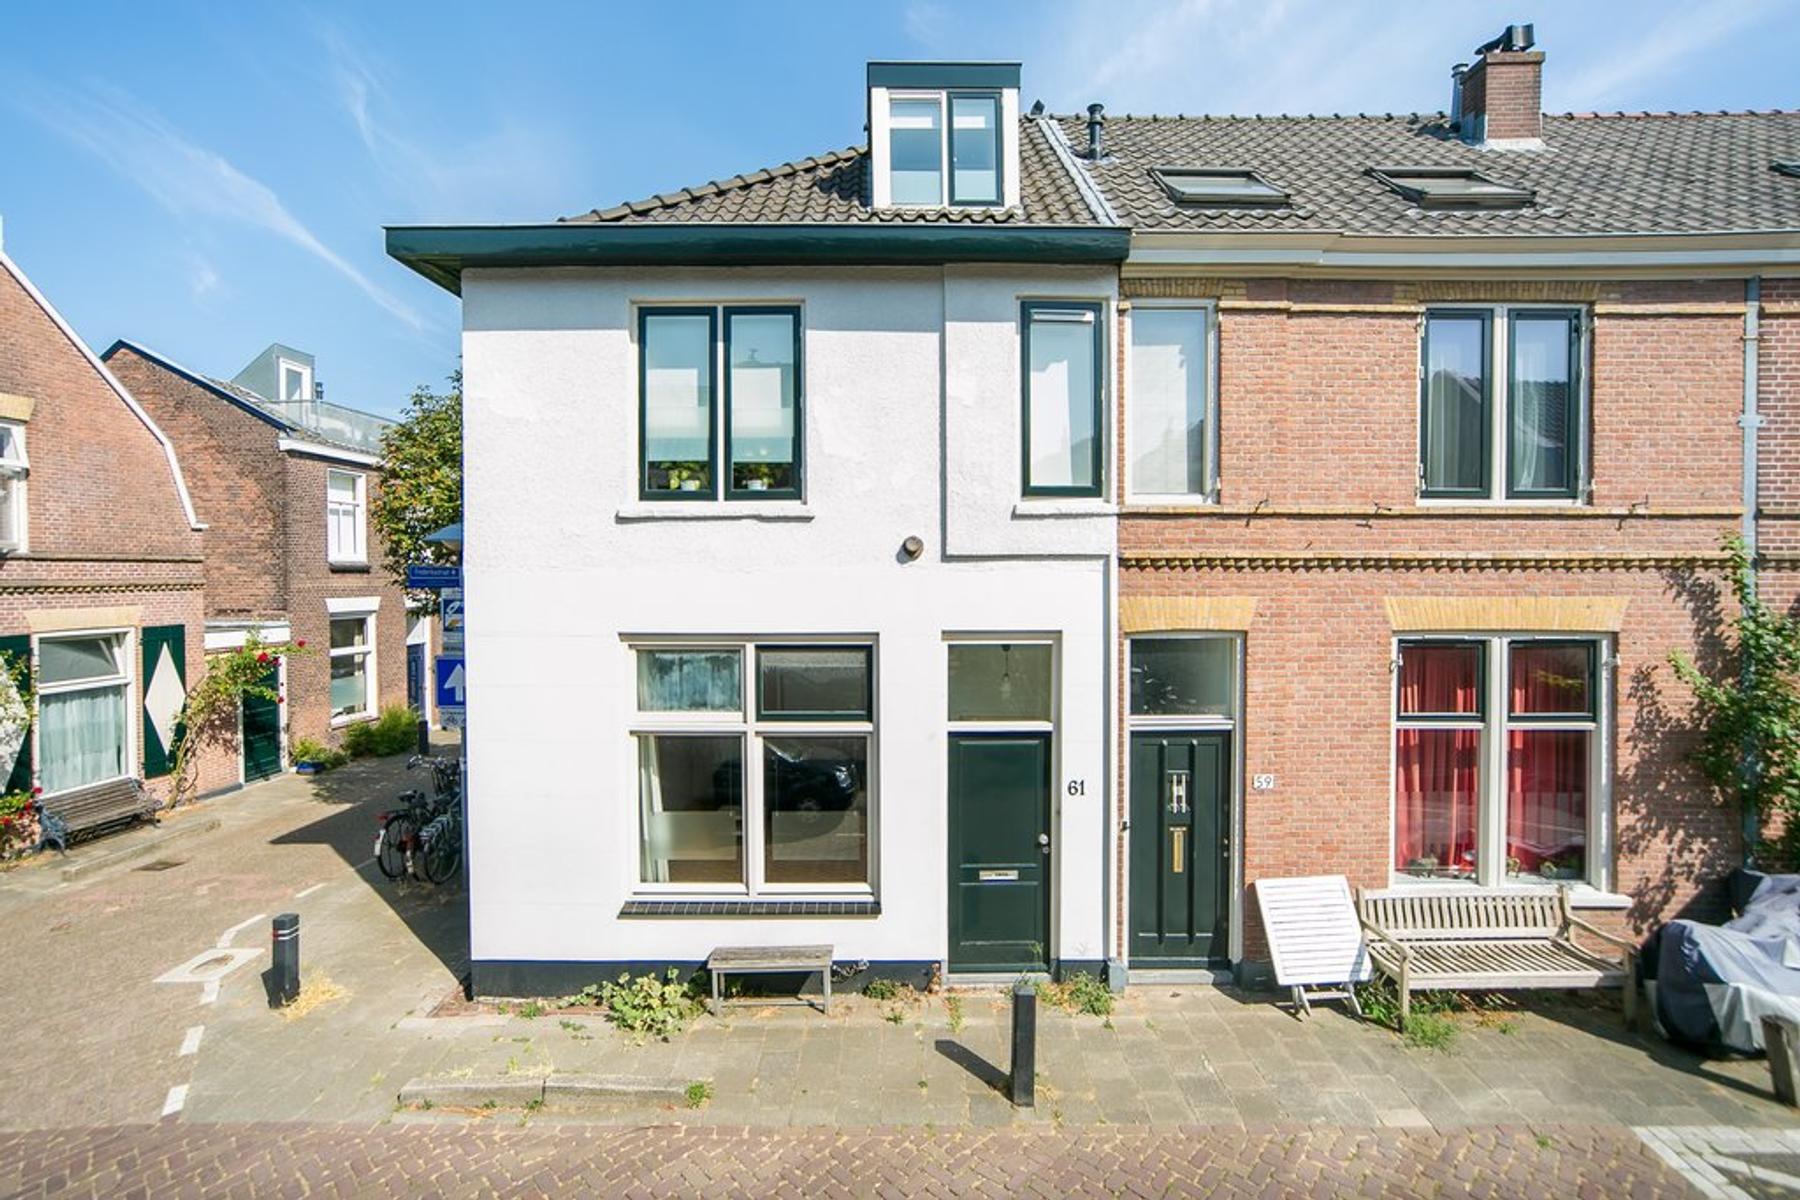 Kapelstraat 61 in Utrecht 3572 CJ